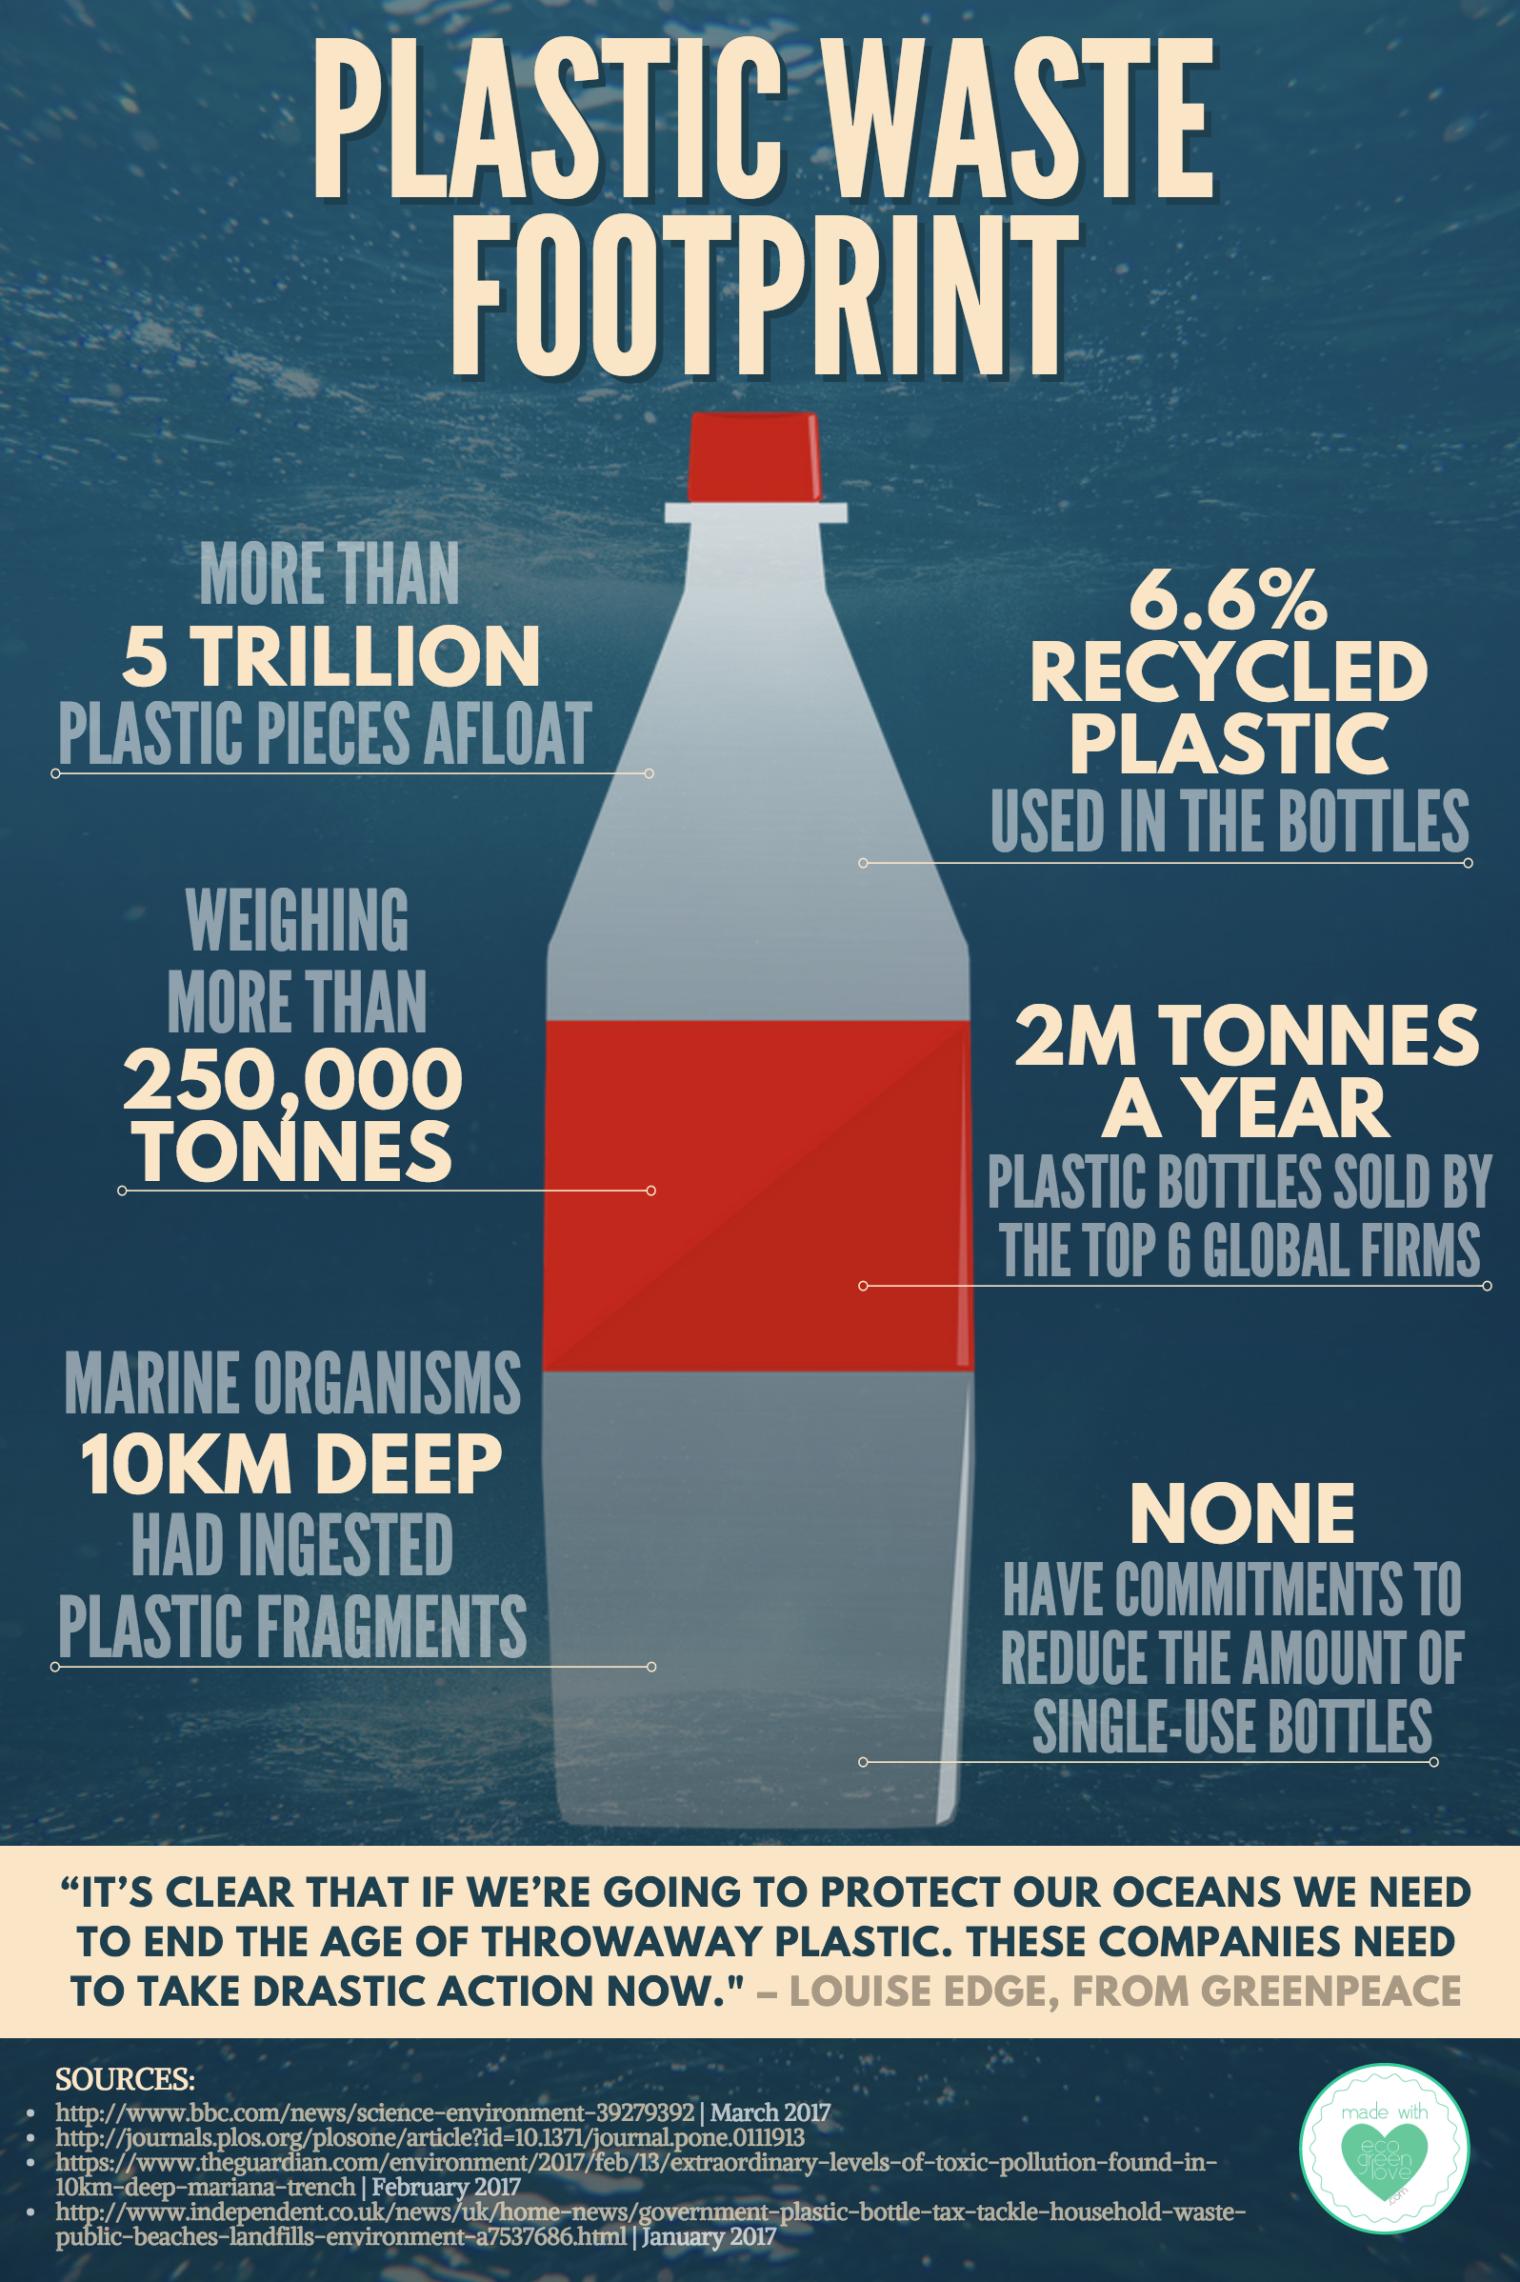 Plastic waste footprint infographic